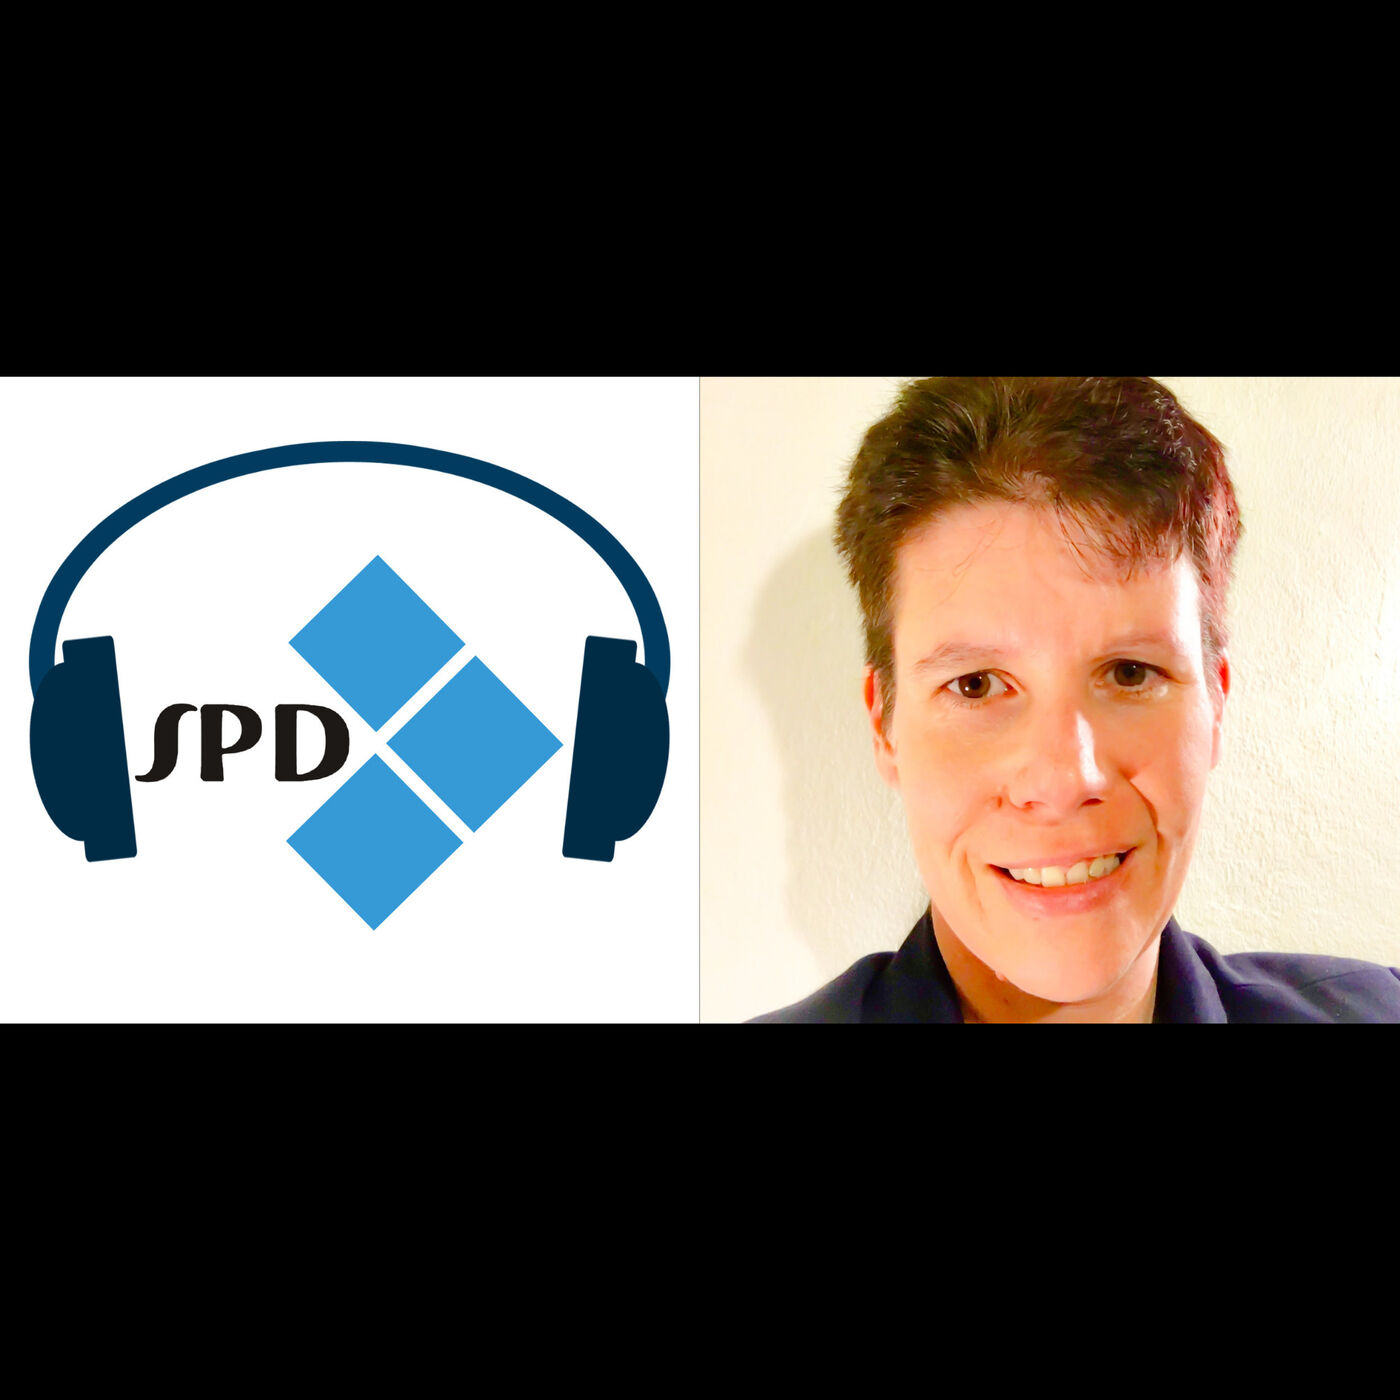 ATA SPD Podcast, An Interview with Carola Berger